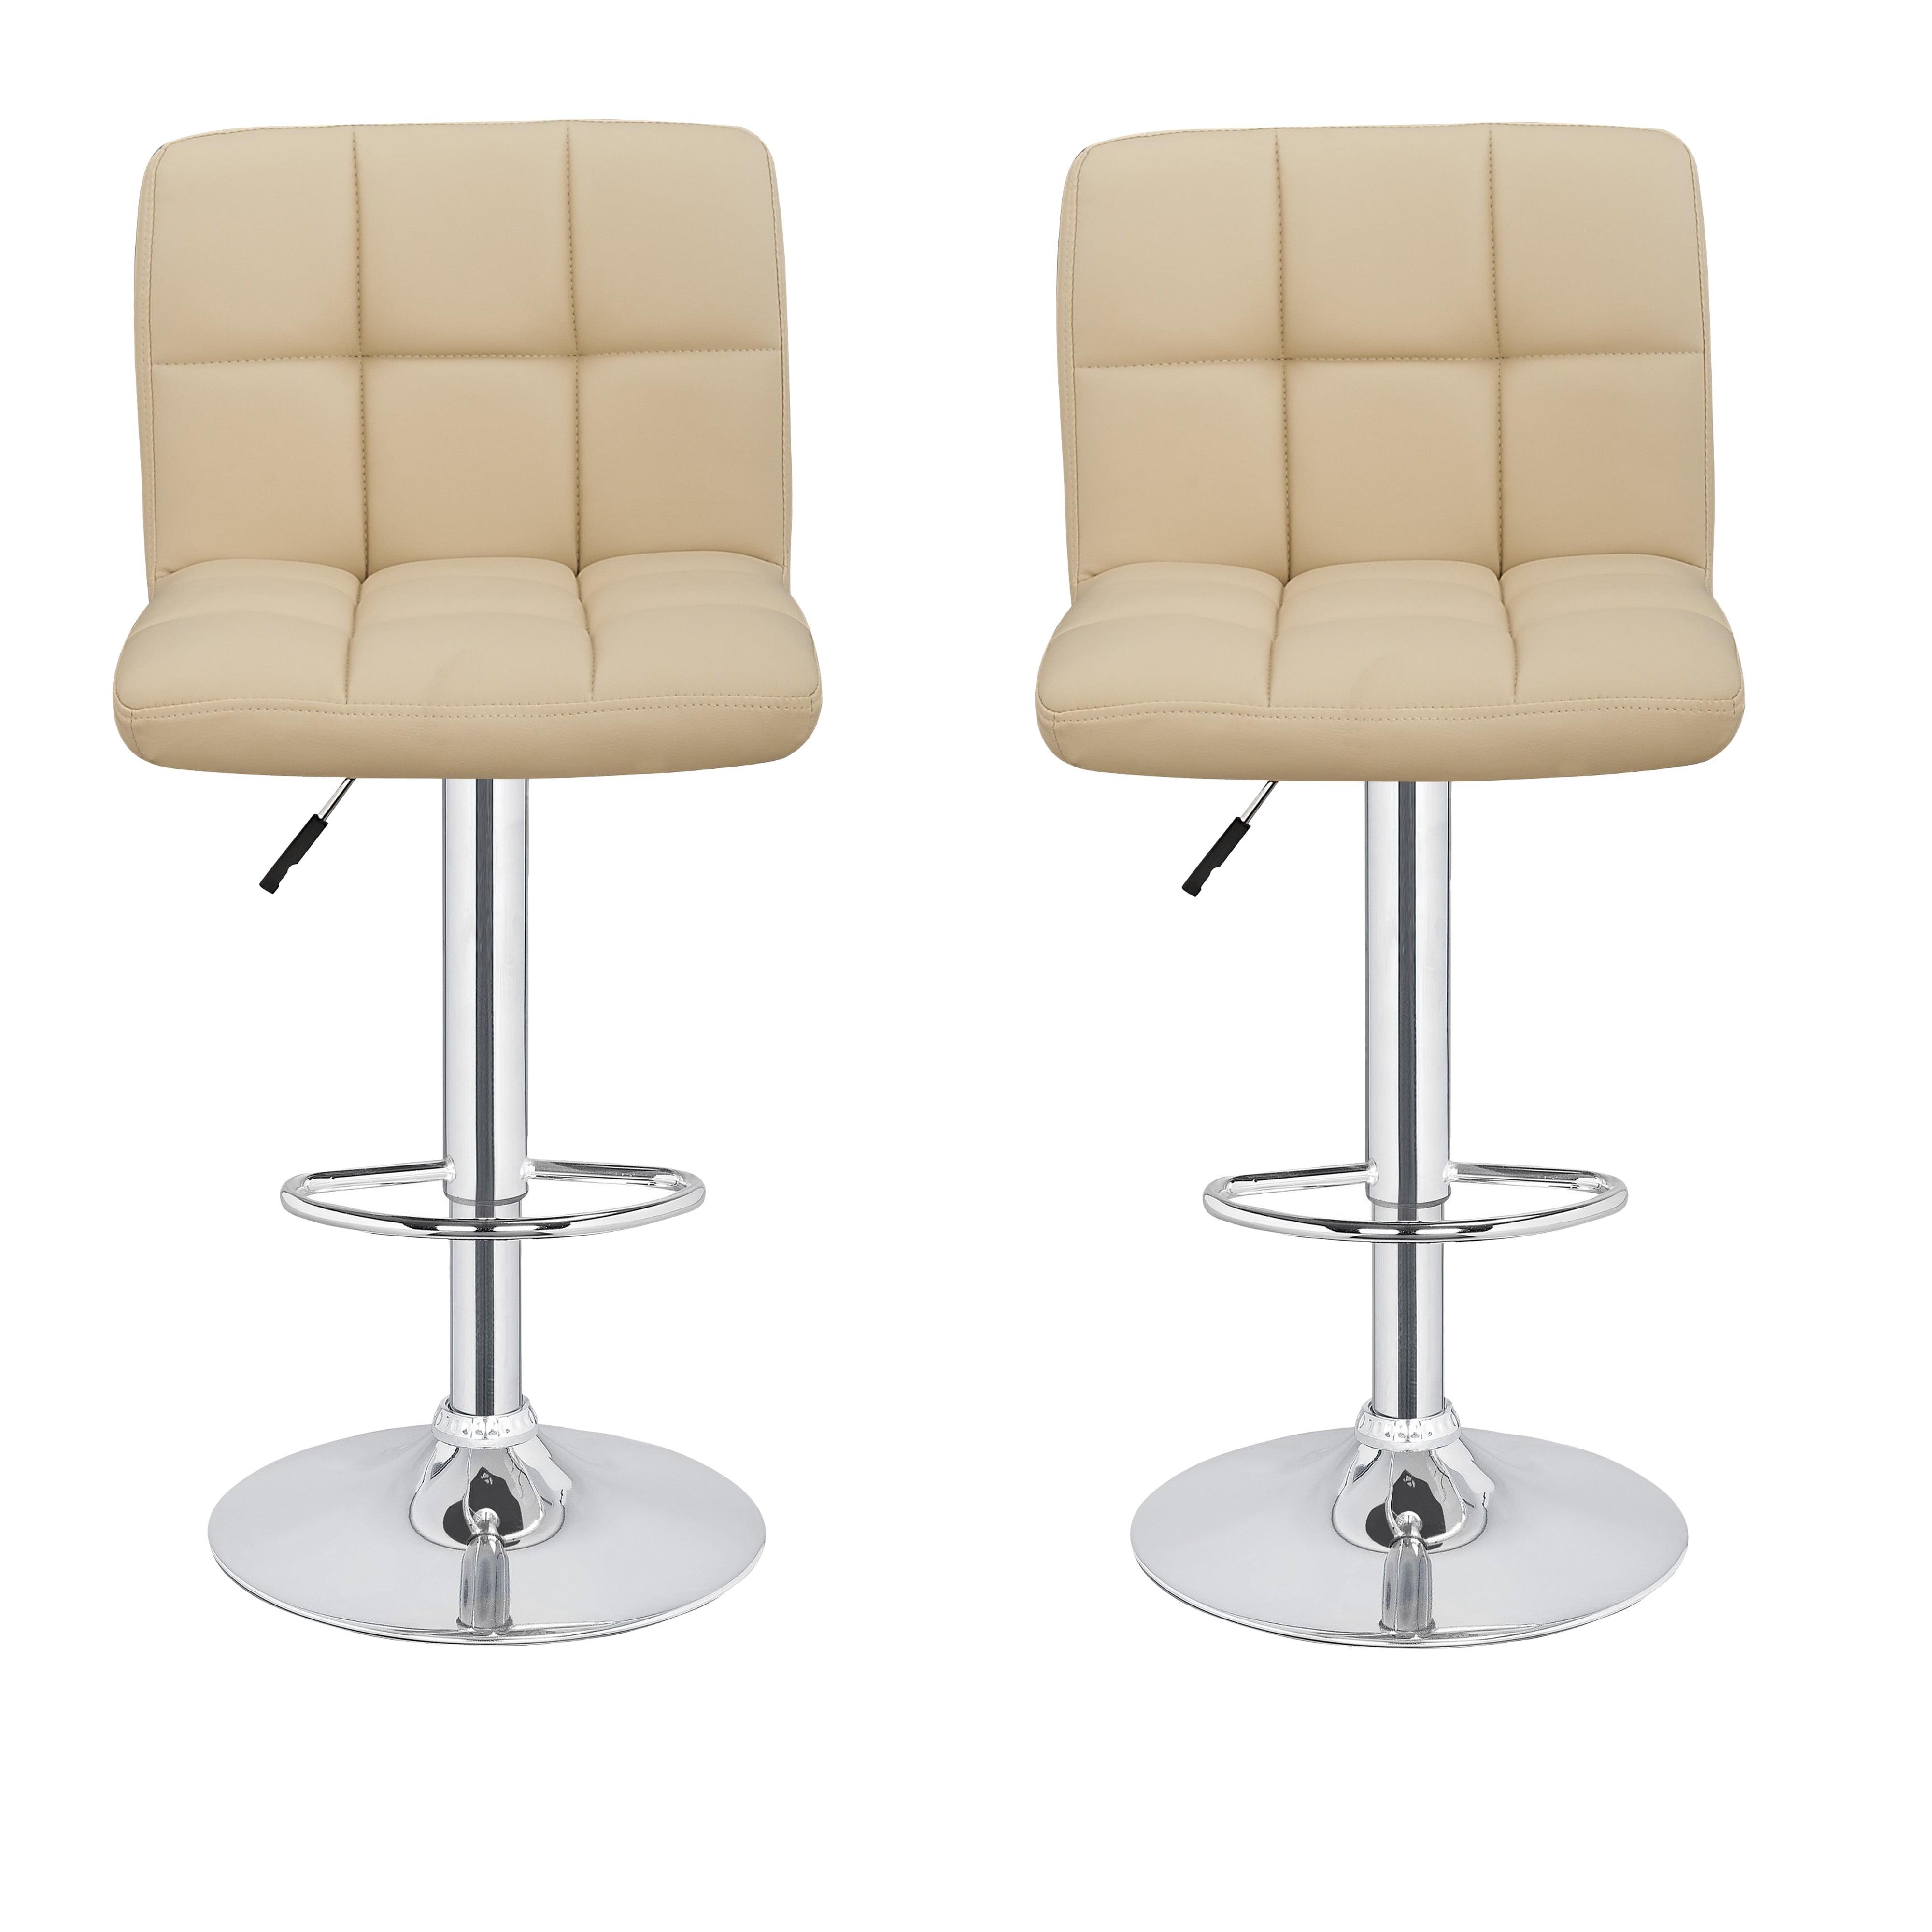 2 x homegear m2 adjustable swivel bar stool cream walmartcom